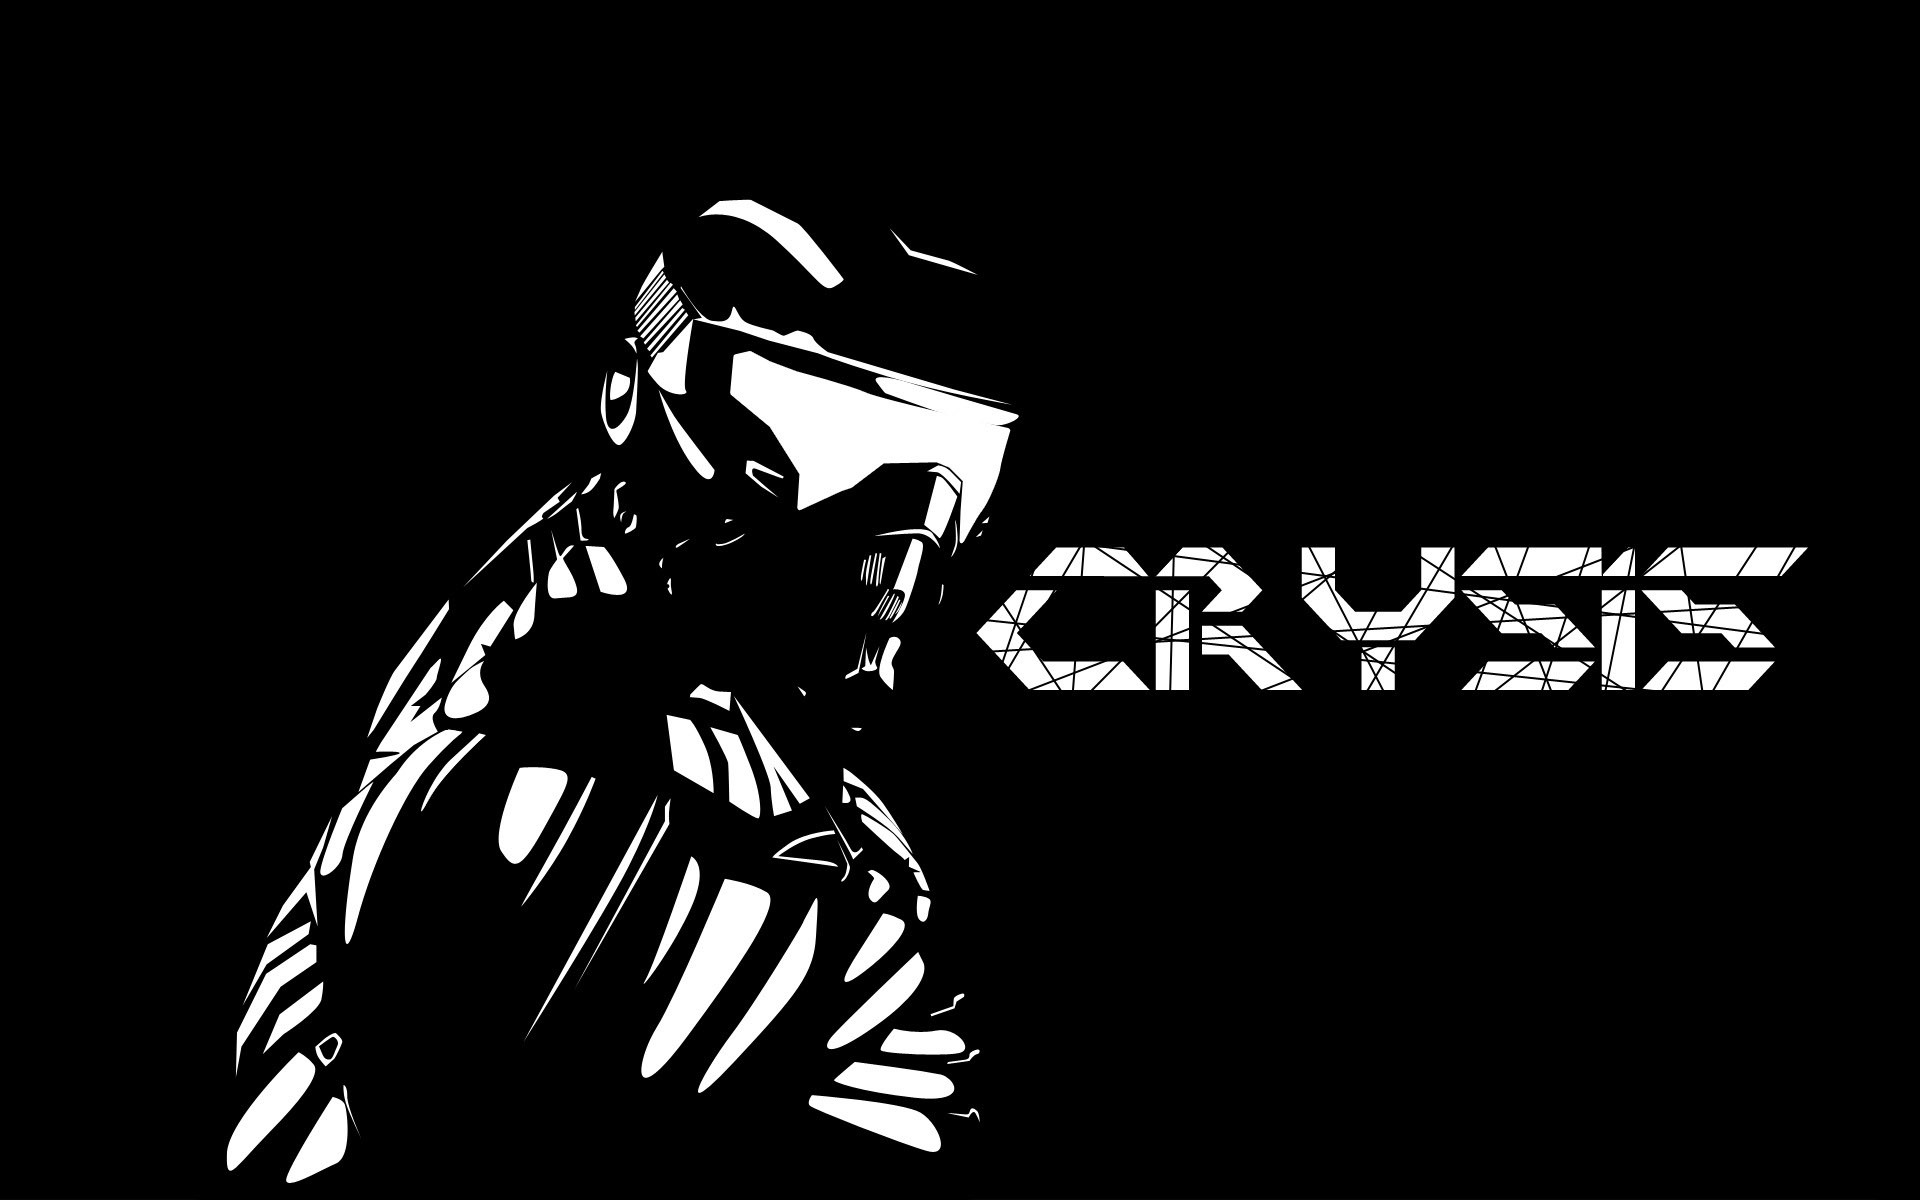 Crysis 2 Wallpaper 7931 1920x1200